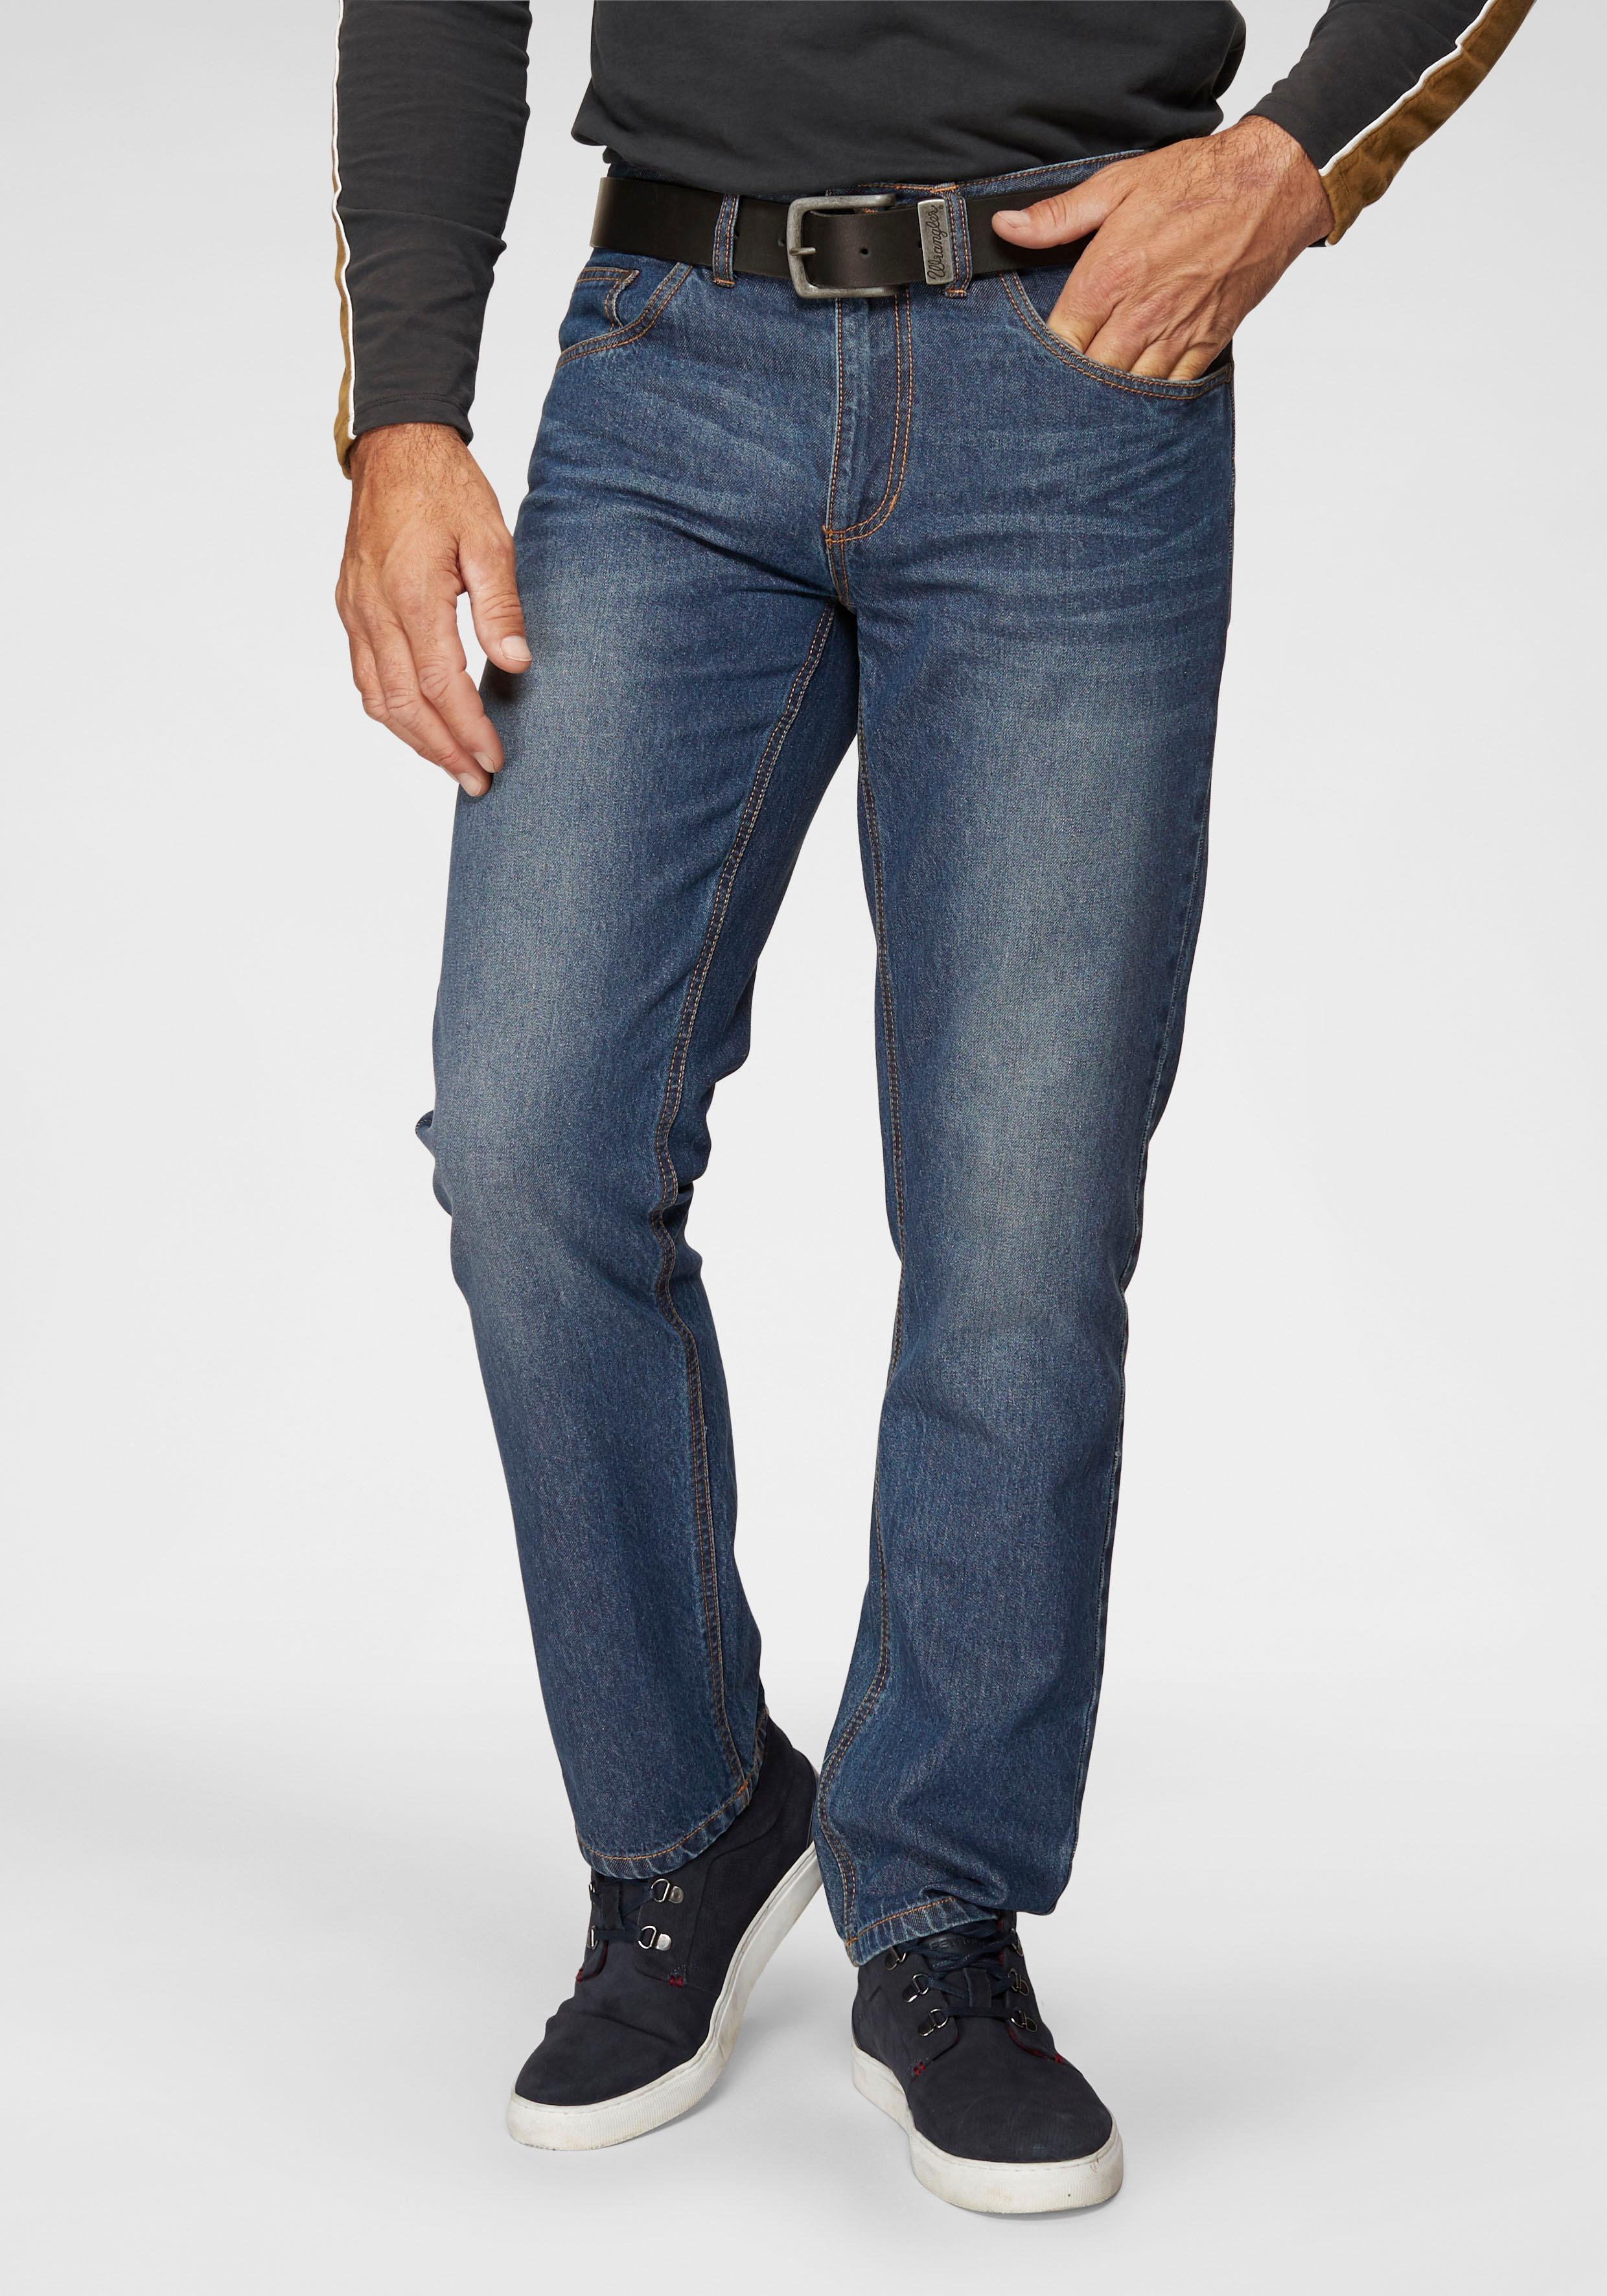 Arizona Slim-fit-Jeans  Scott  Preisvergleich